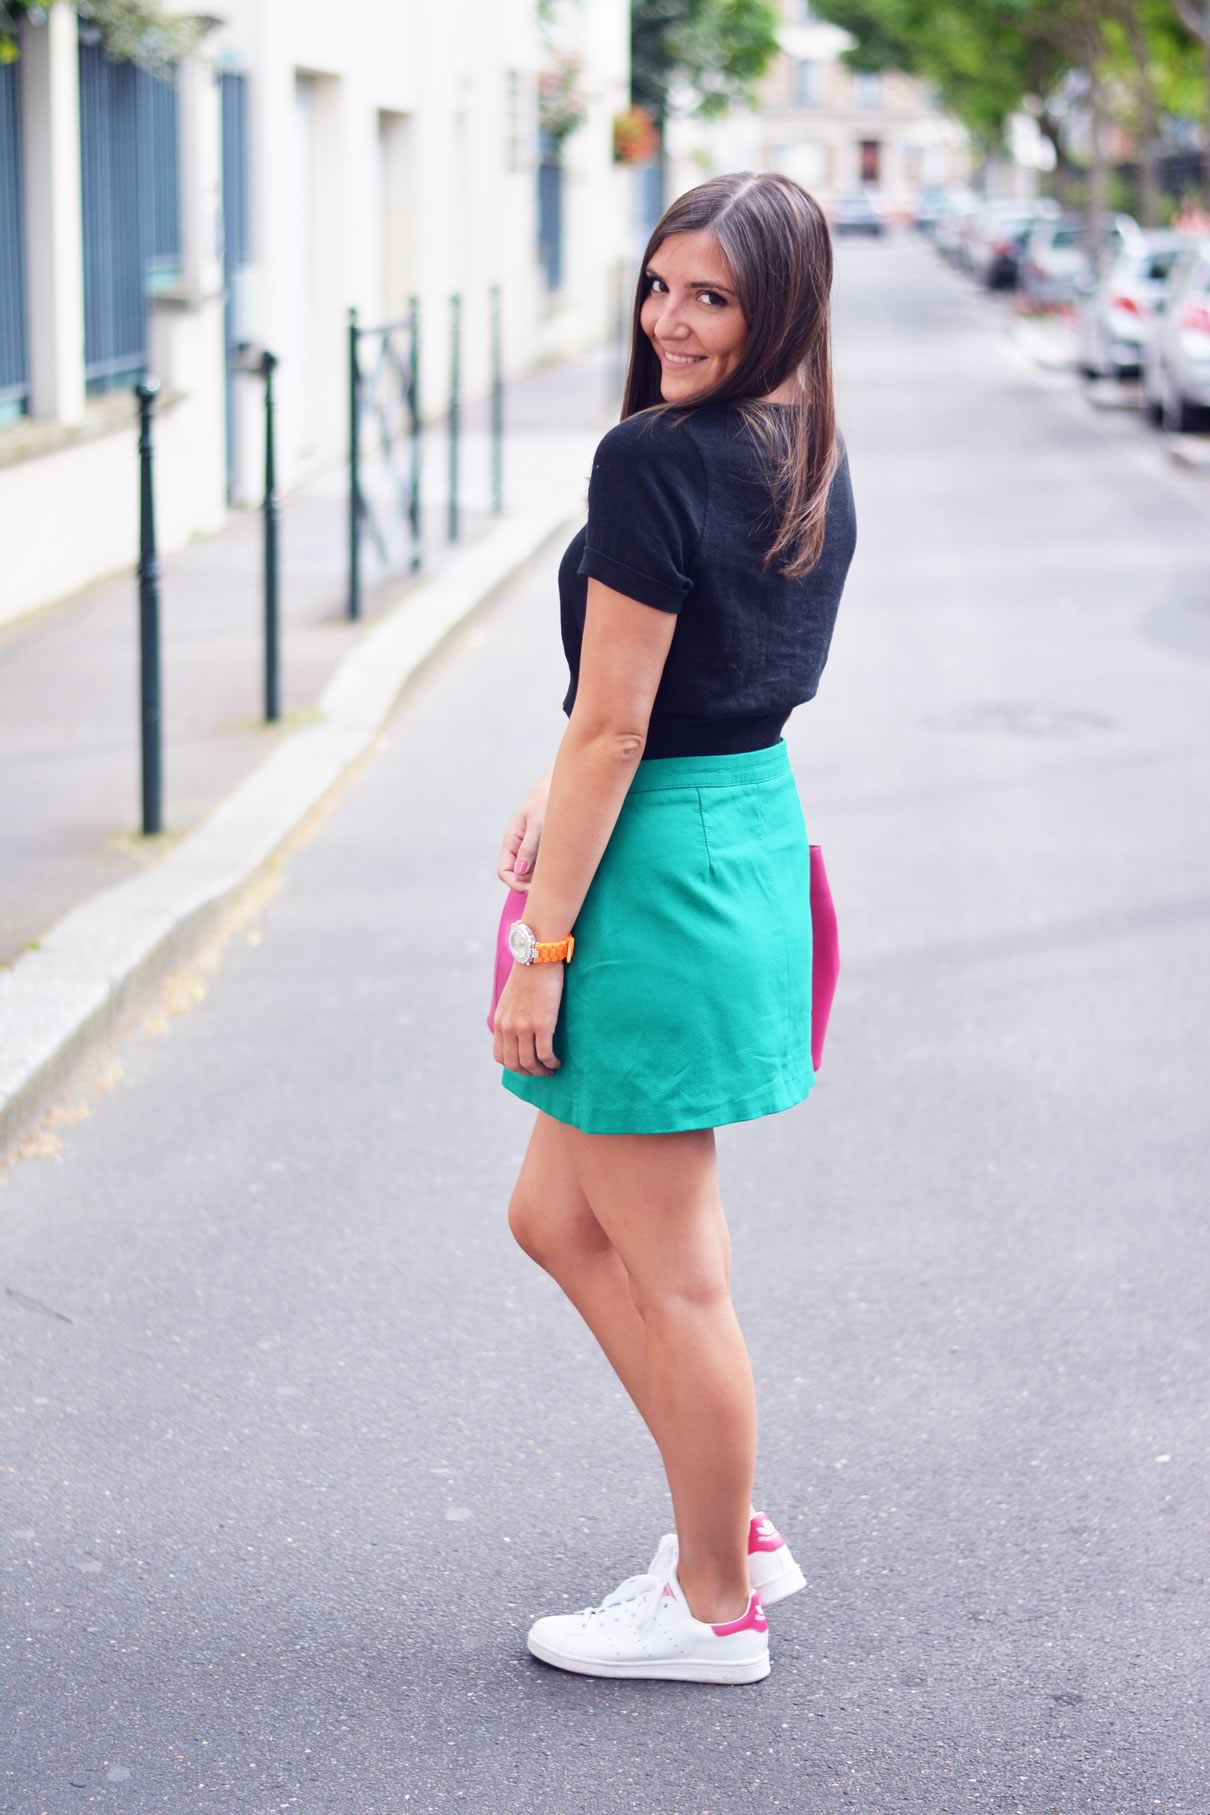 comment porter la jupe verte